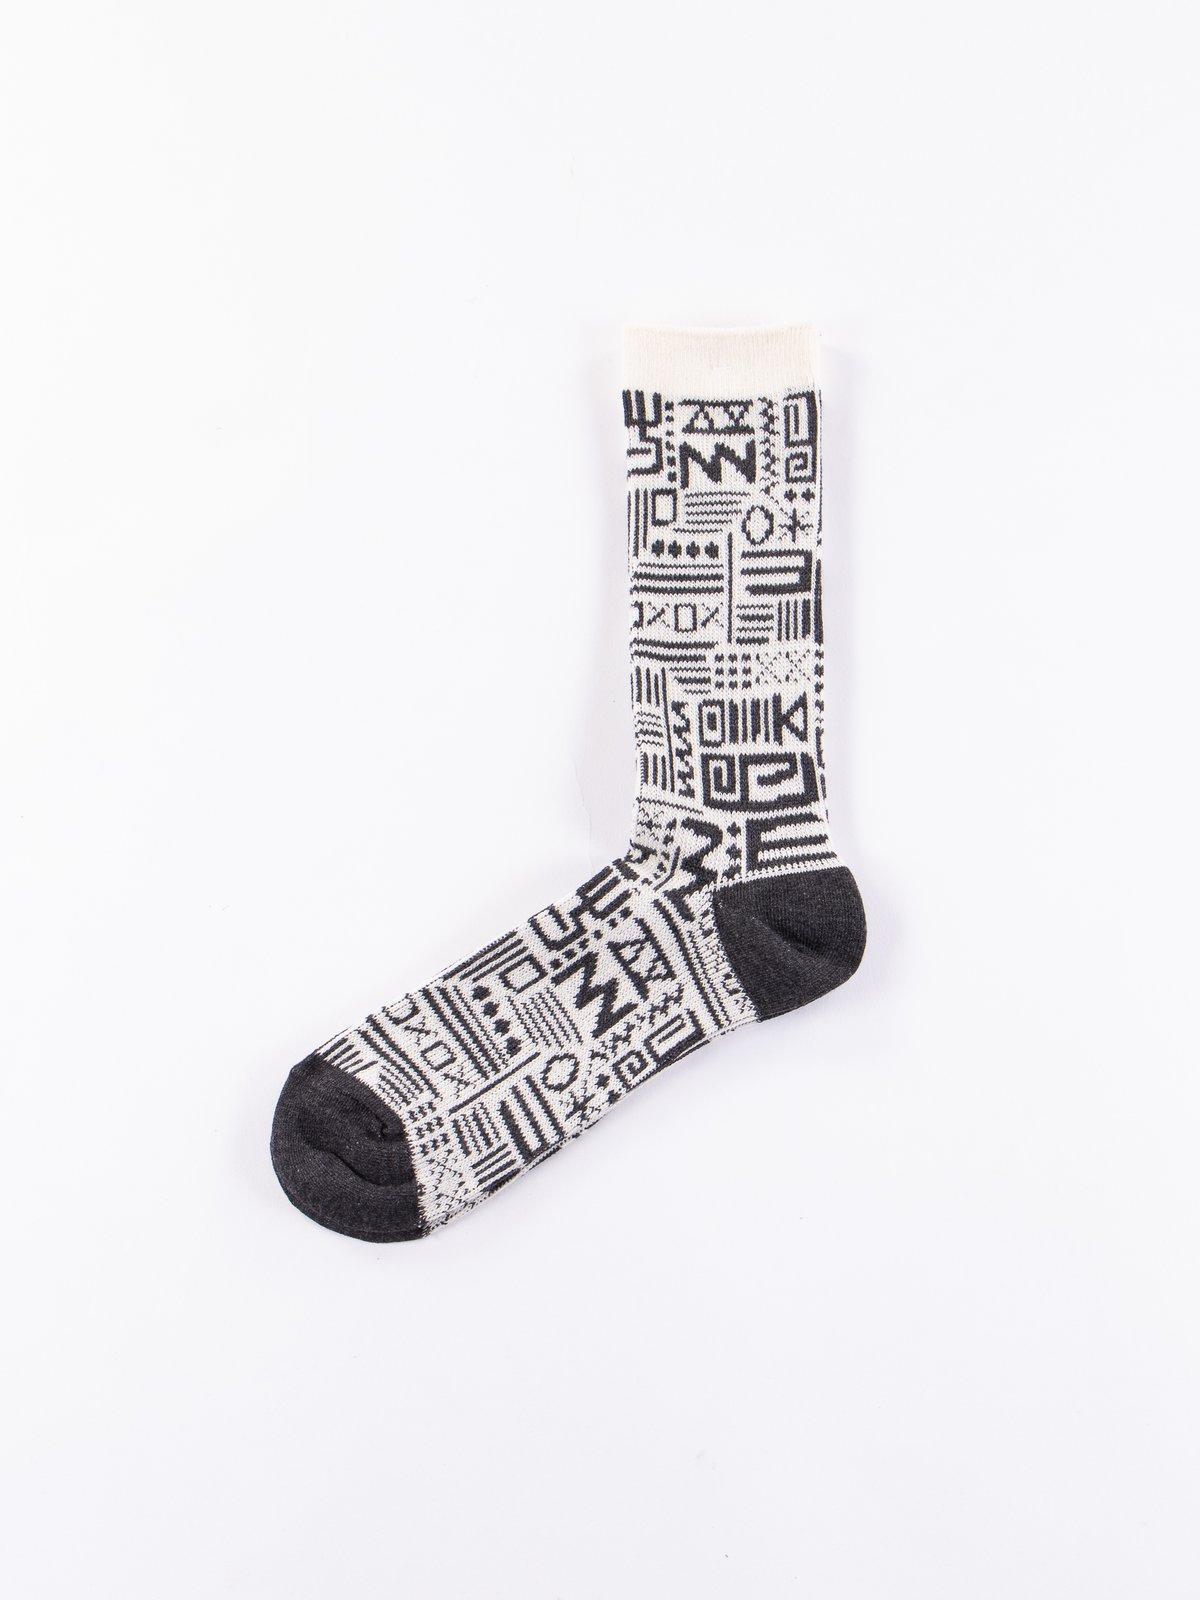 Off White Aztec Knit Socks - Image 1